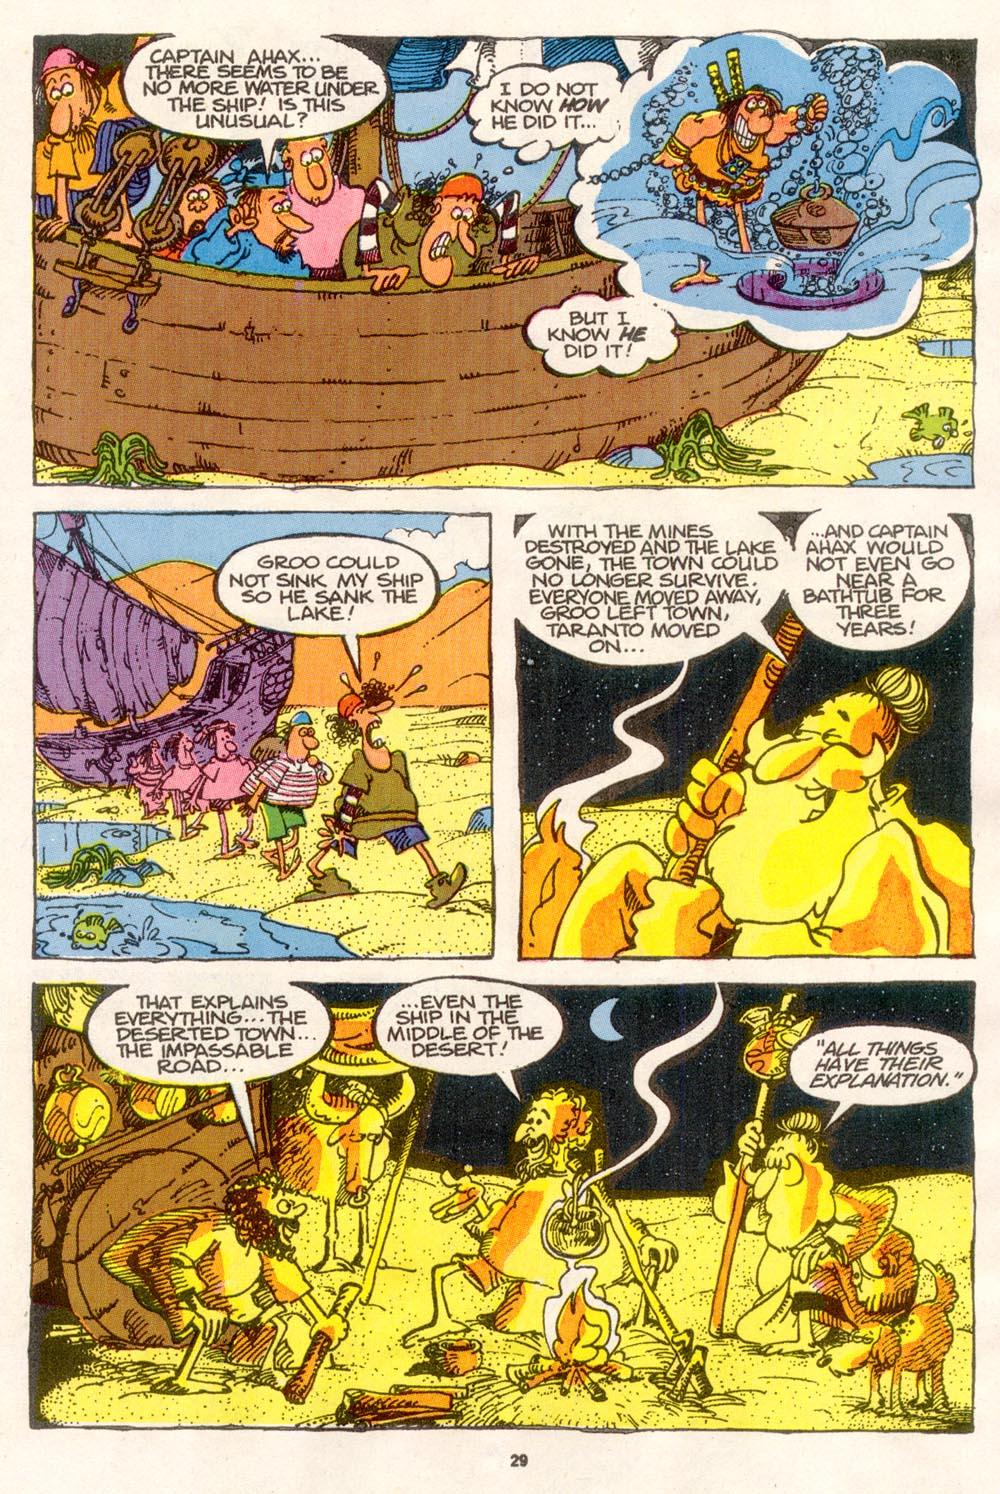 Read online Sergio Aragonés Groo the Wanderer comic -  Issue #76 - 22